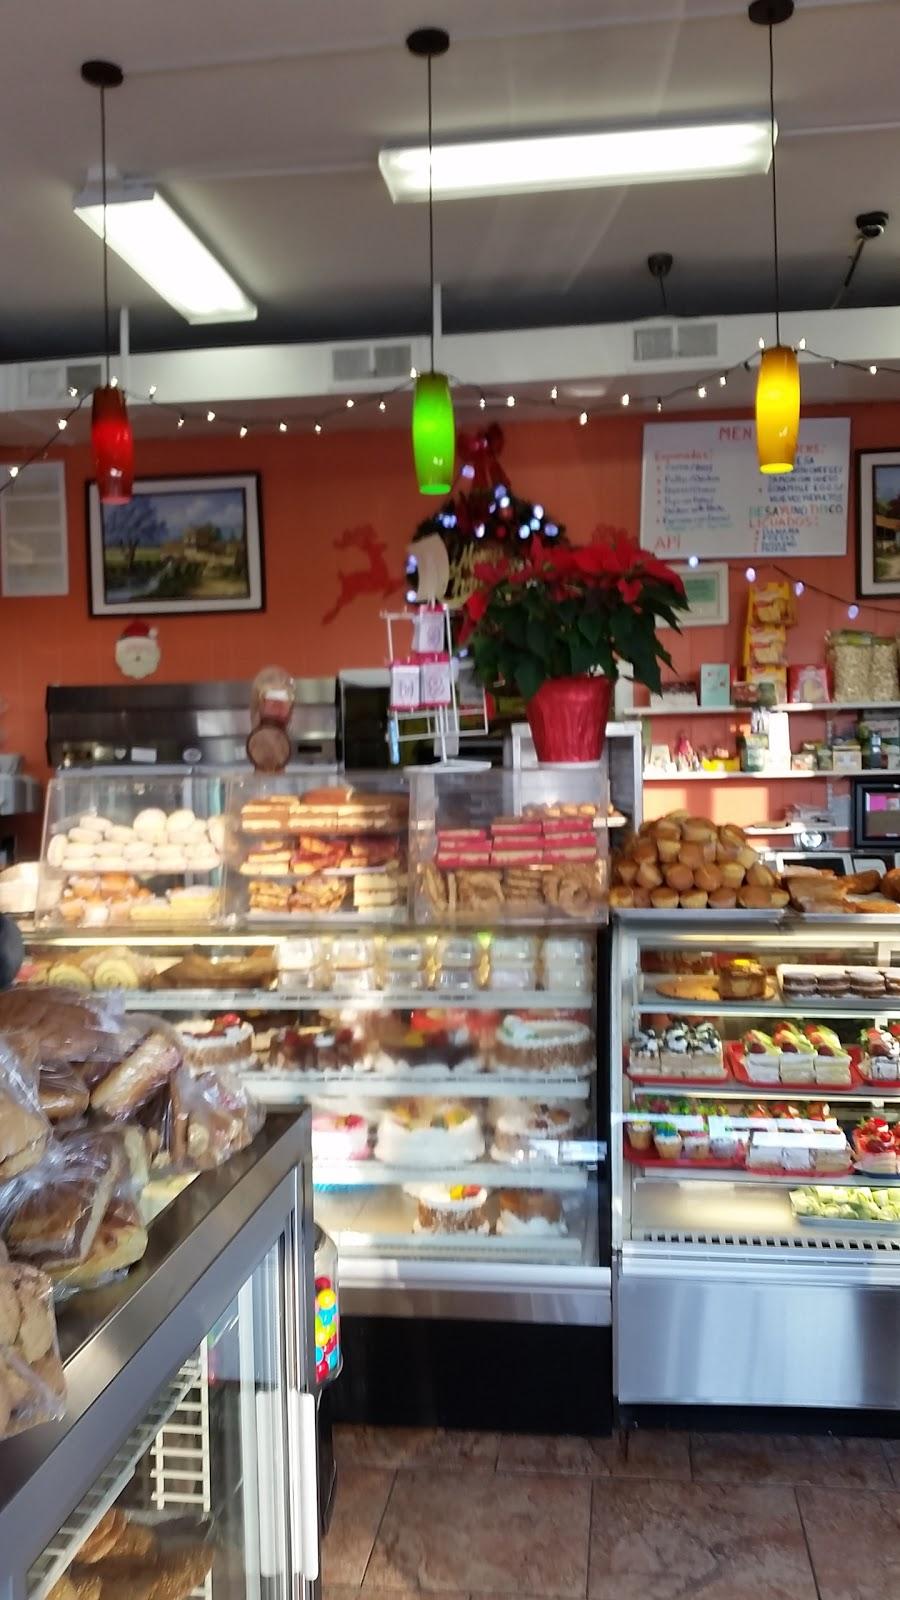 Caramelo Bakery - bakery  | Photo 1 of 10 | Address: 11301 Georgia Ave, Silver Spring, MD 20902, USA | Phone: (301) 942-9330